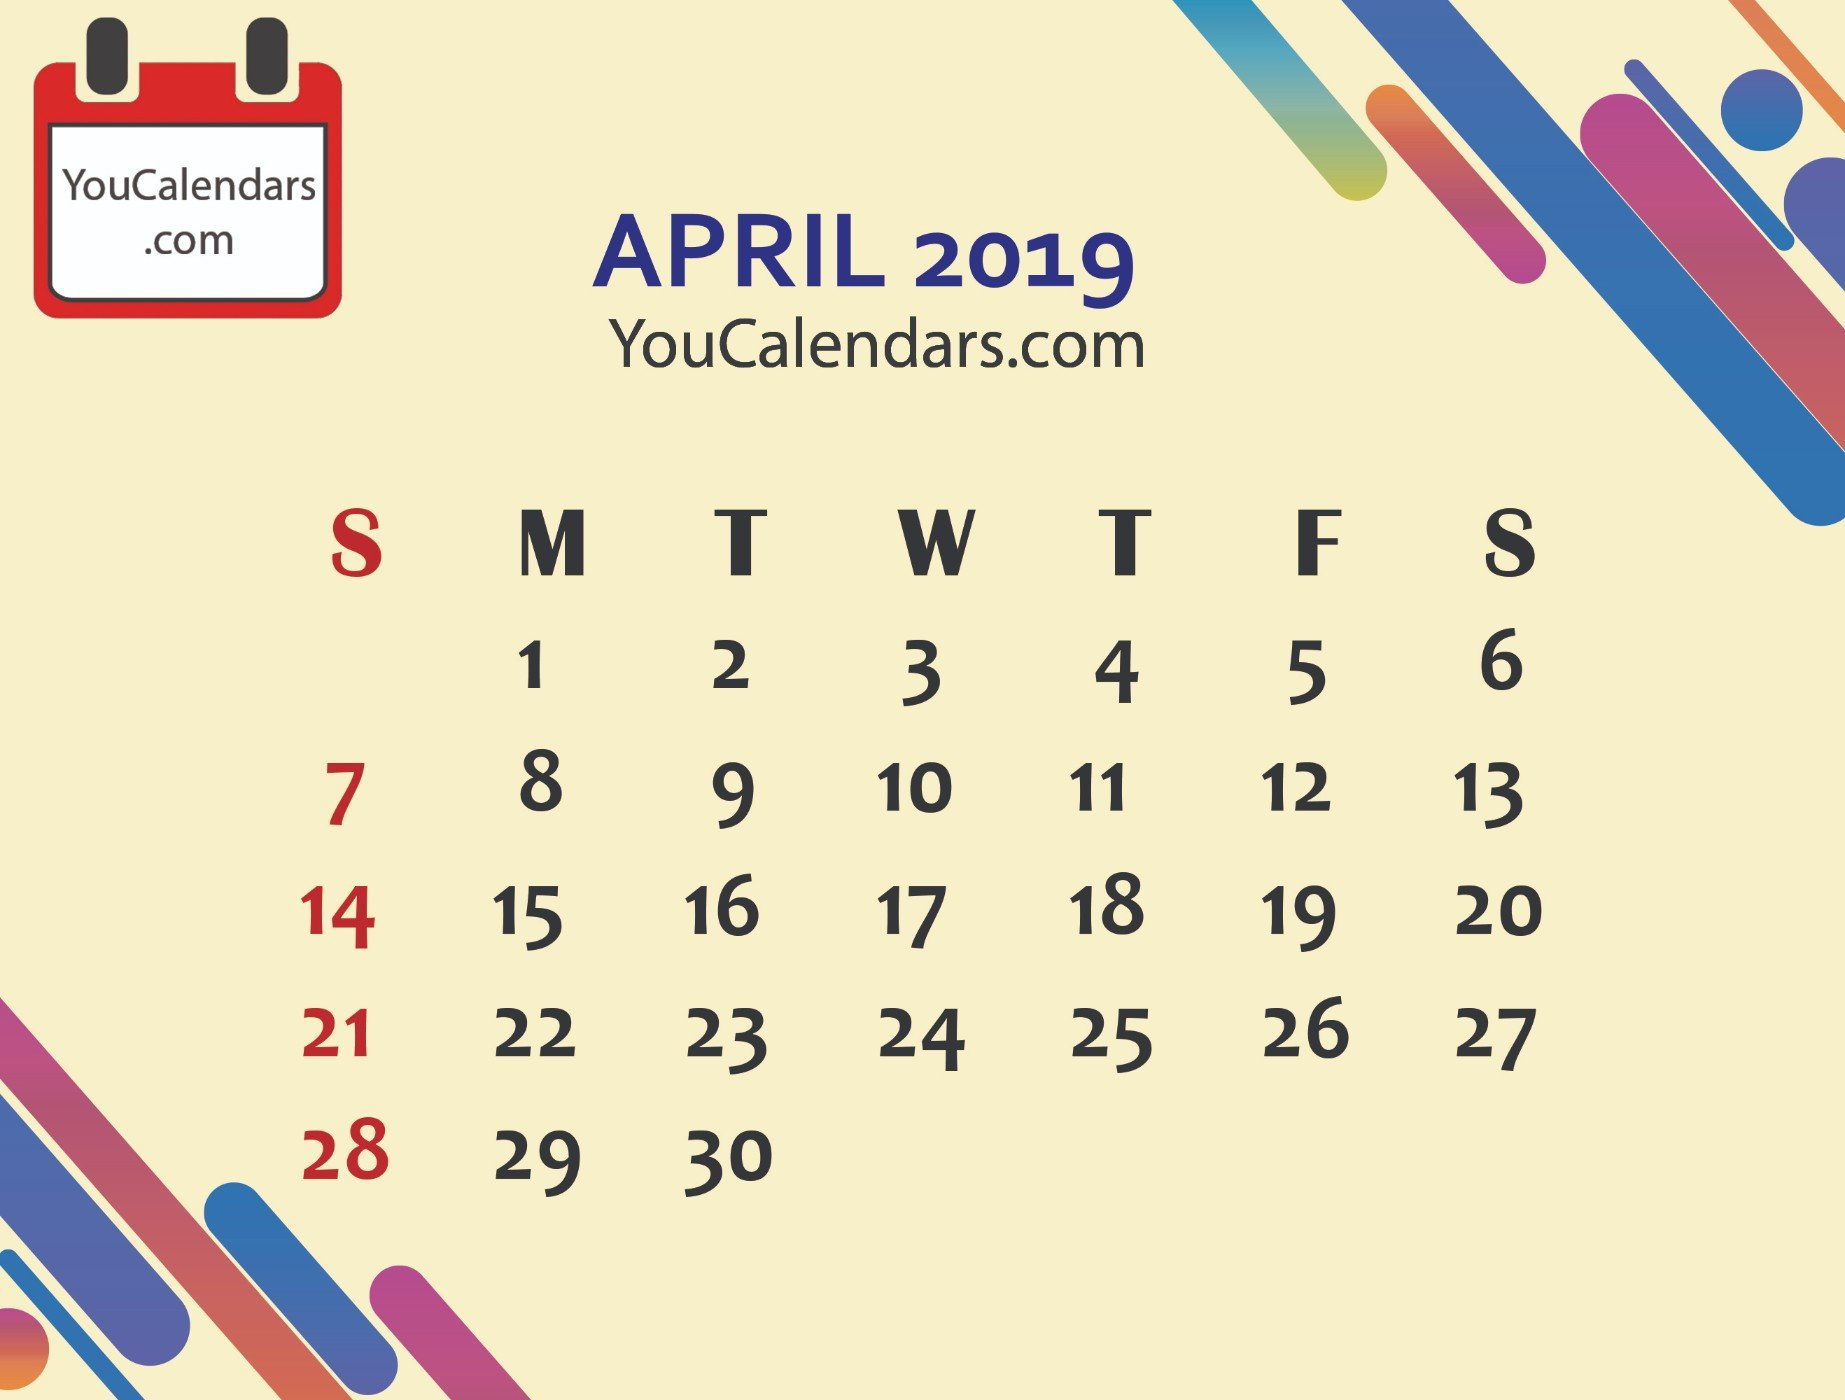 ✅Free April 2019 Calendar Printable Template – You Calendars April 5 2019 Calendar